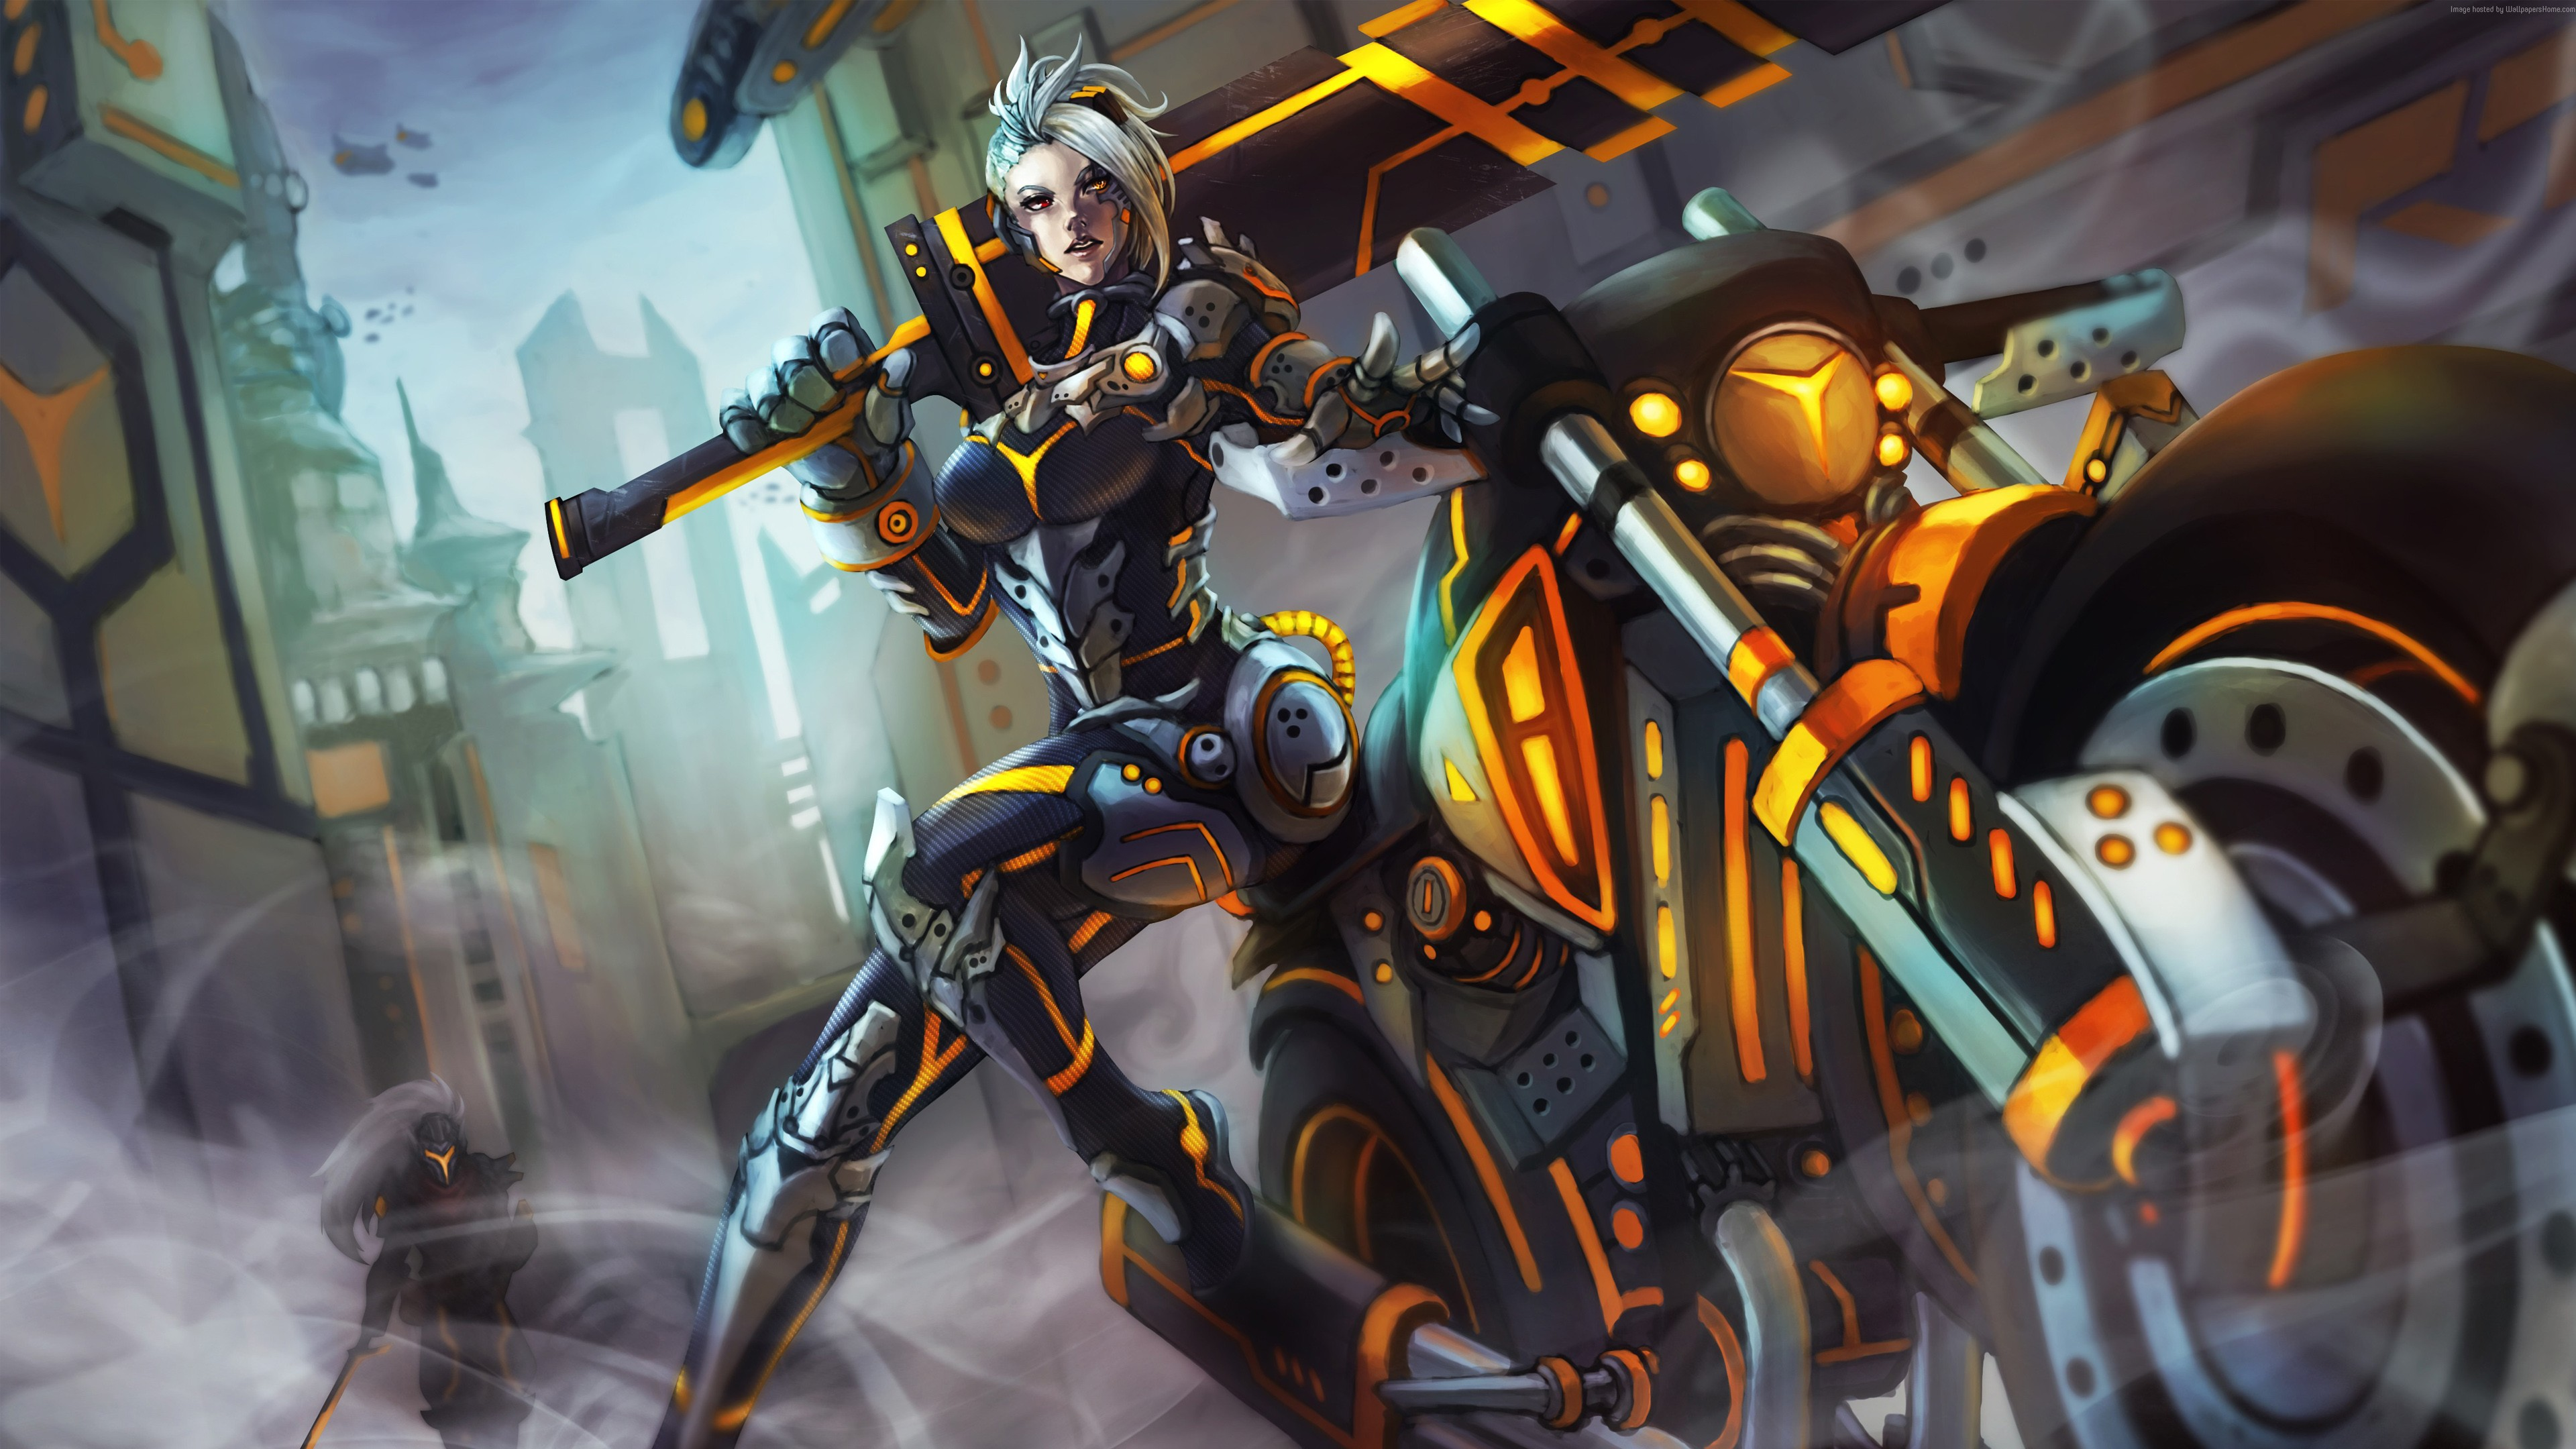 Riven League Of Legends 4k Hd Games 4k Wallpapers Images